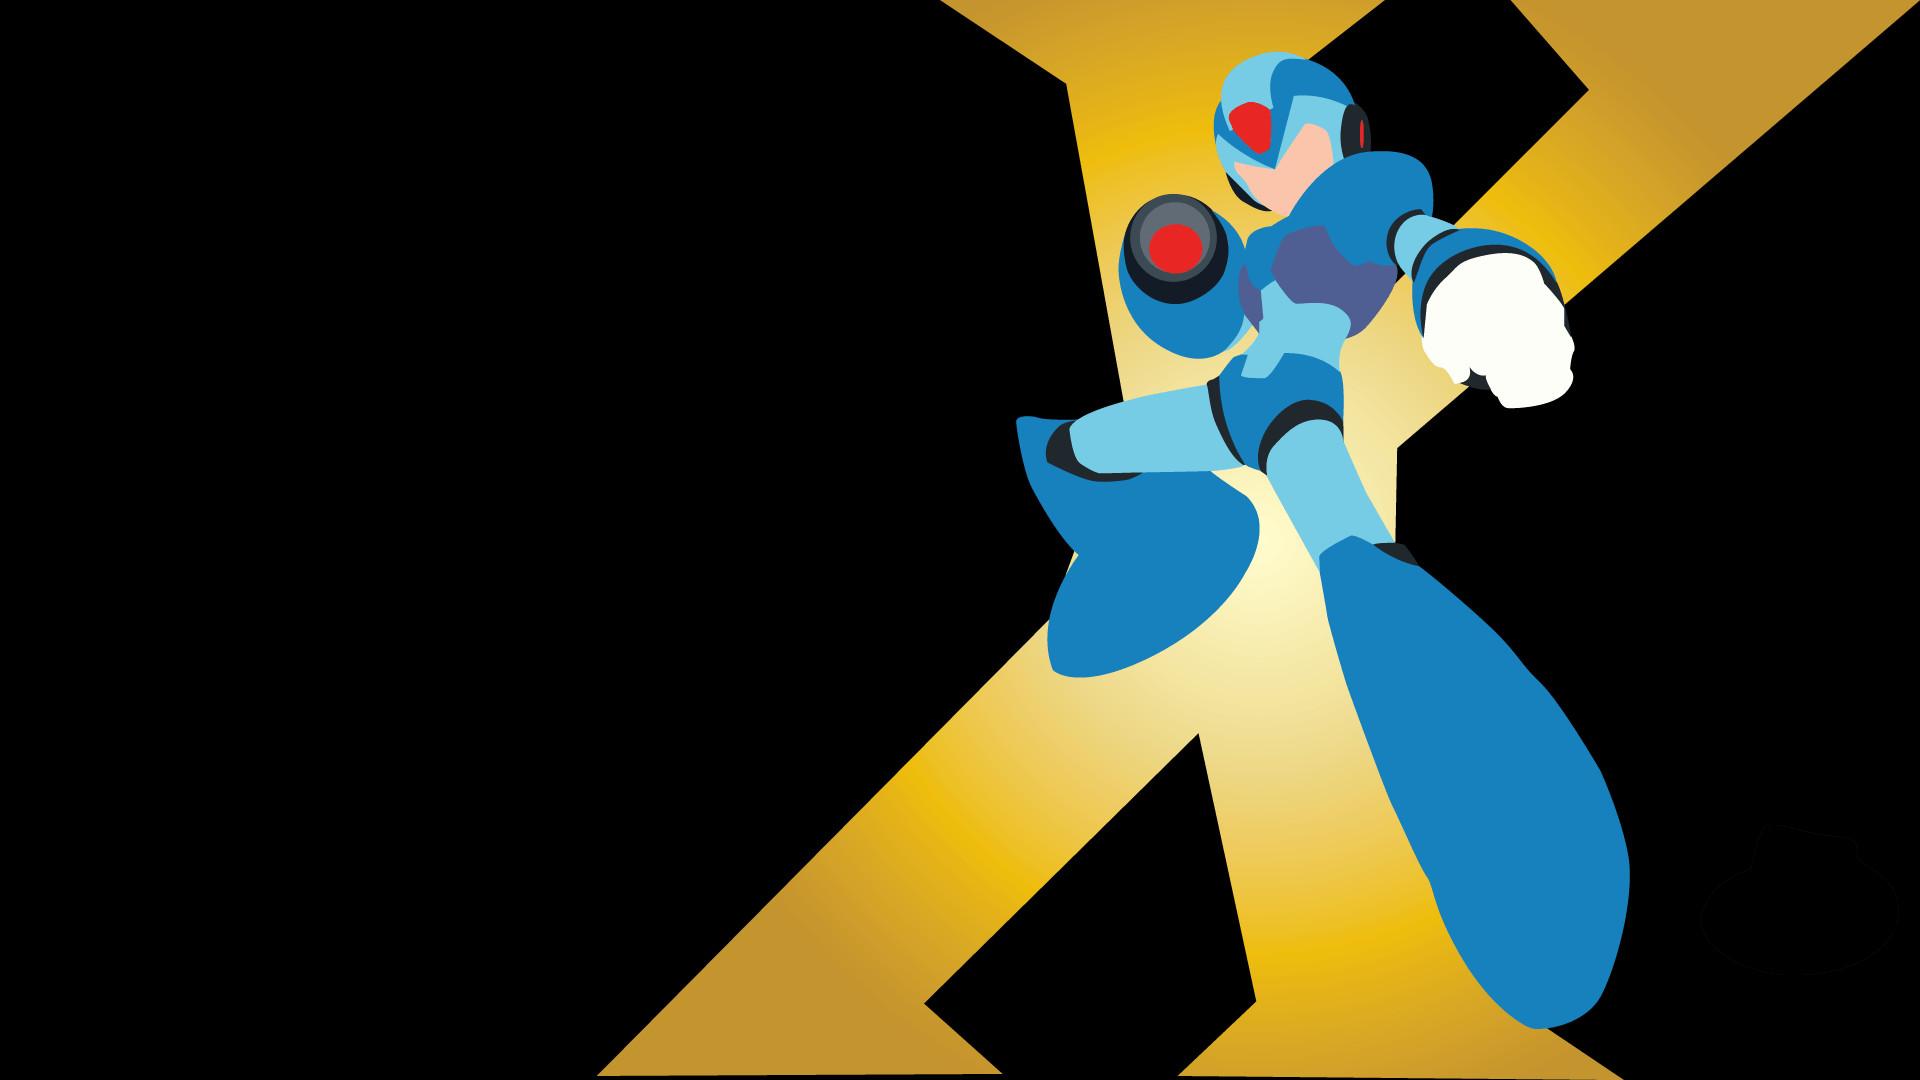 12 Mega Man X Wallpapers | Mega Man X Backgrounds